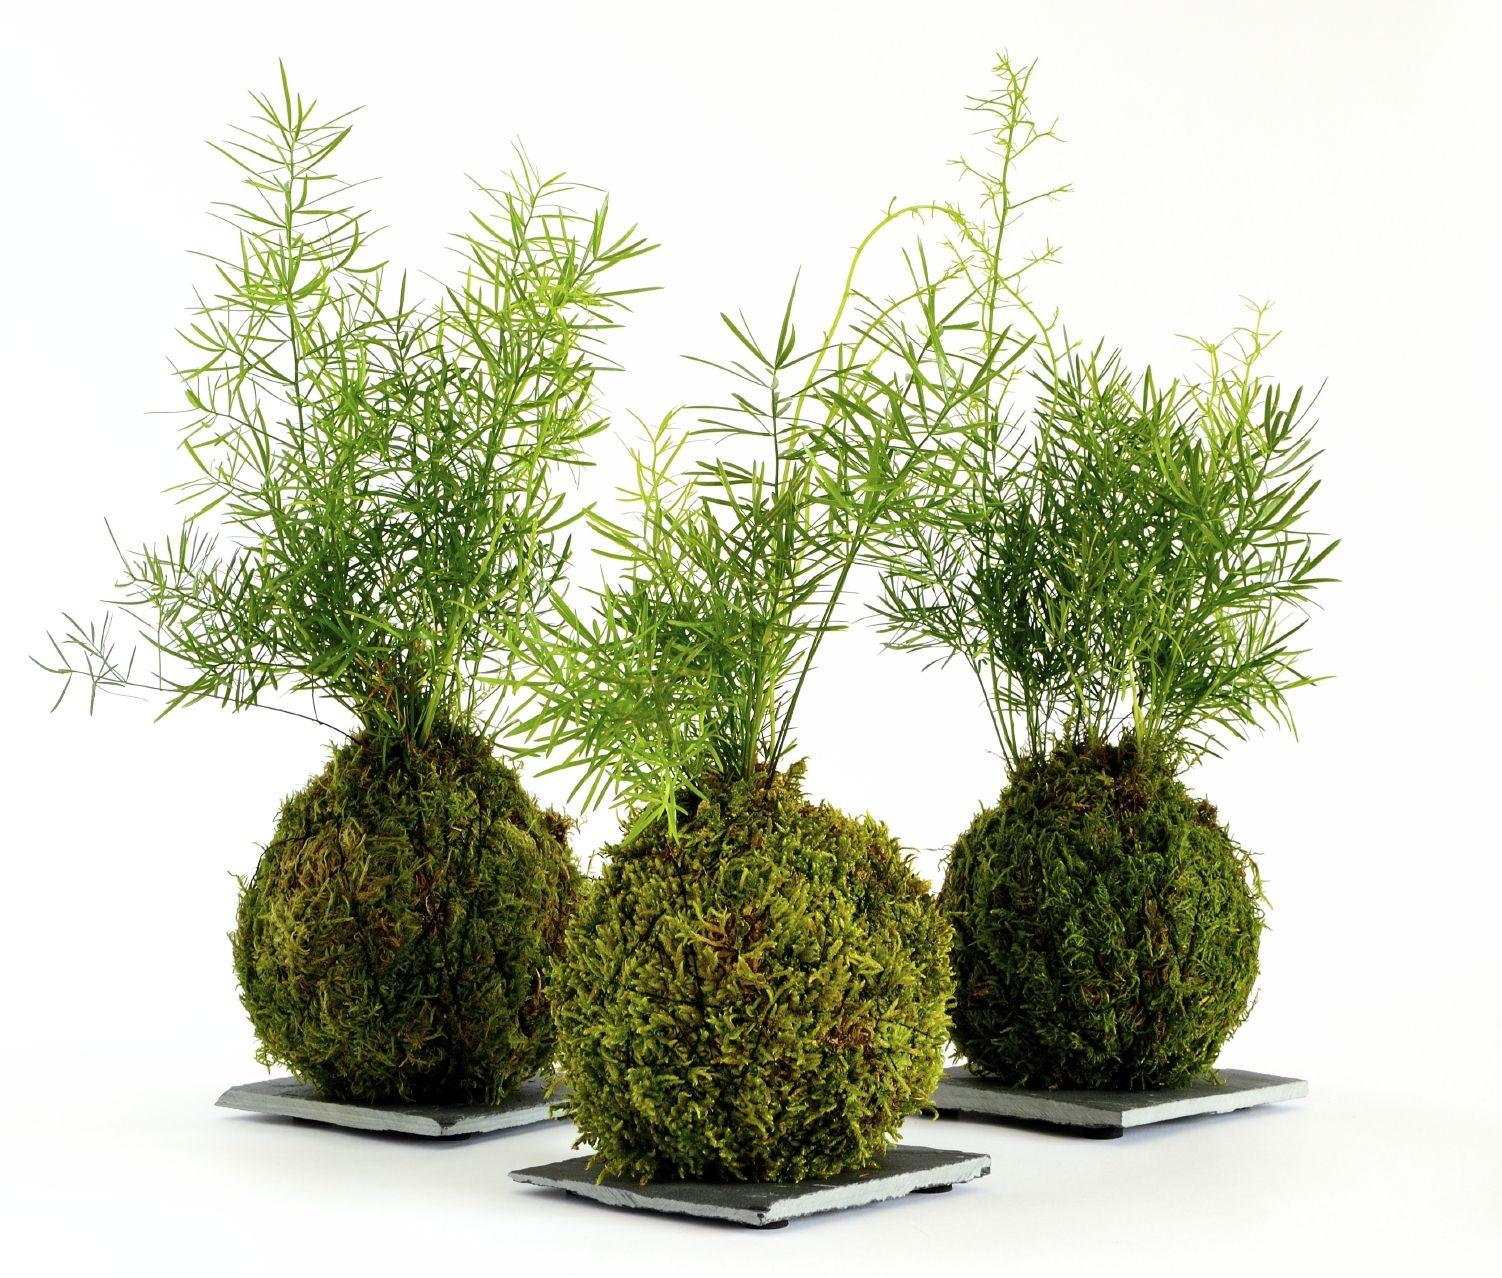 Japanese Garden Plants: How To Make A Japanese Moss Ball